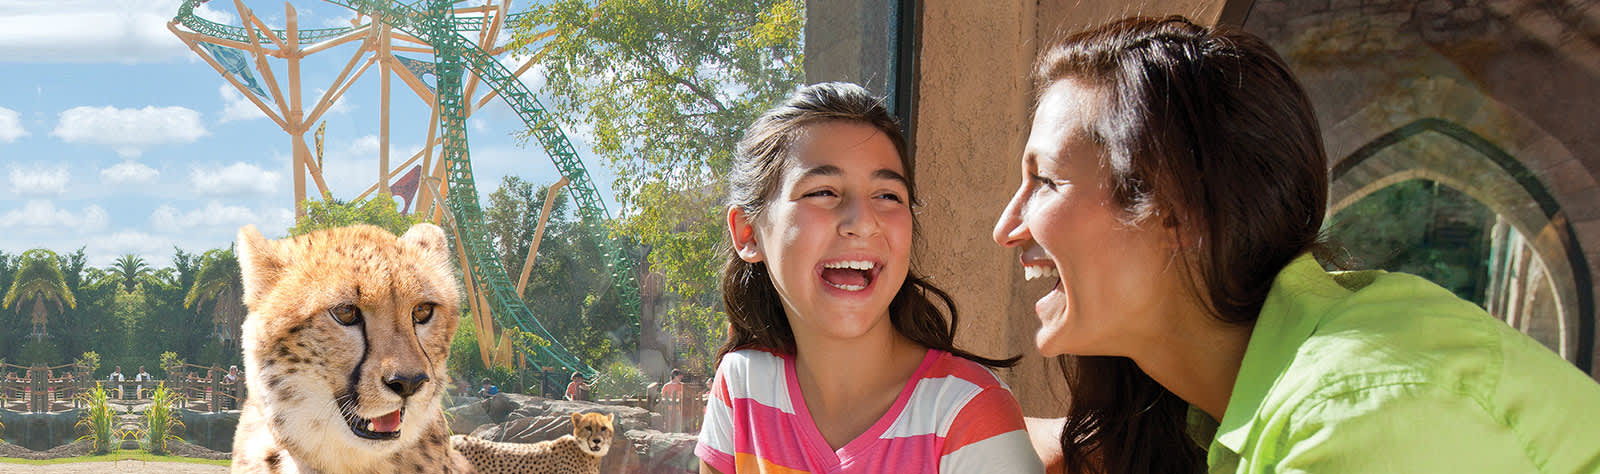 Busch Gardens Tampa at Florida